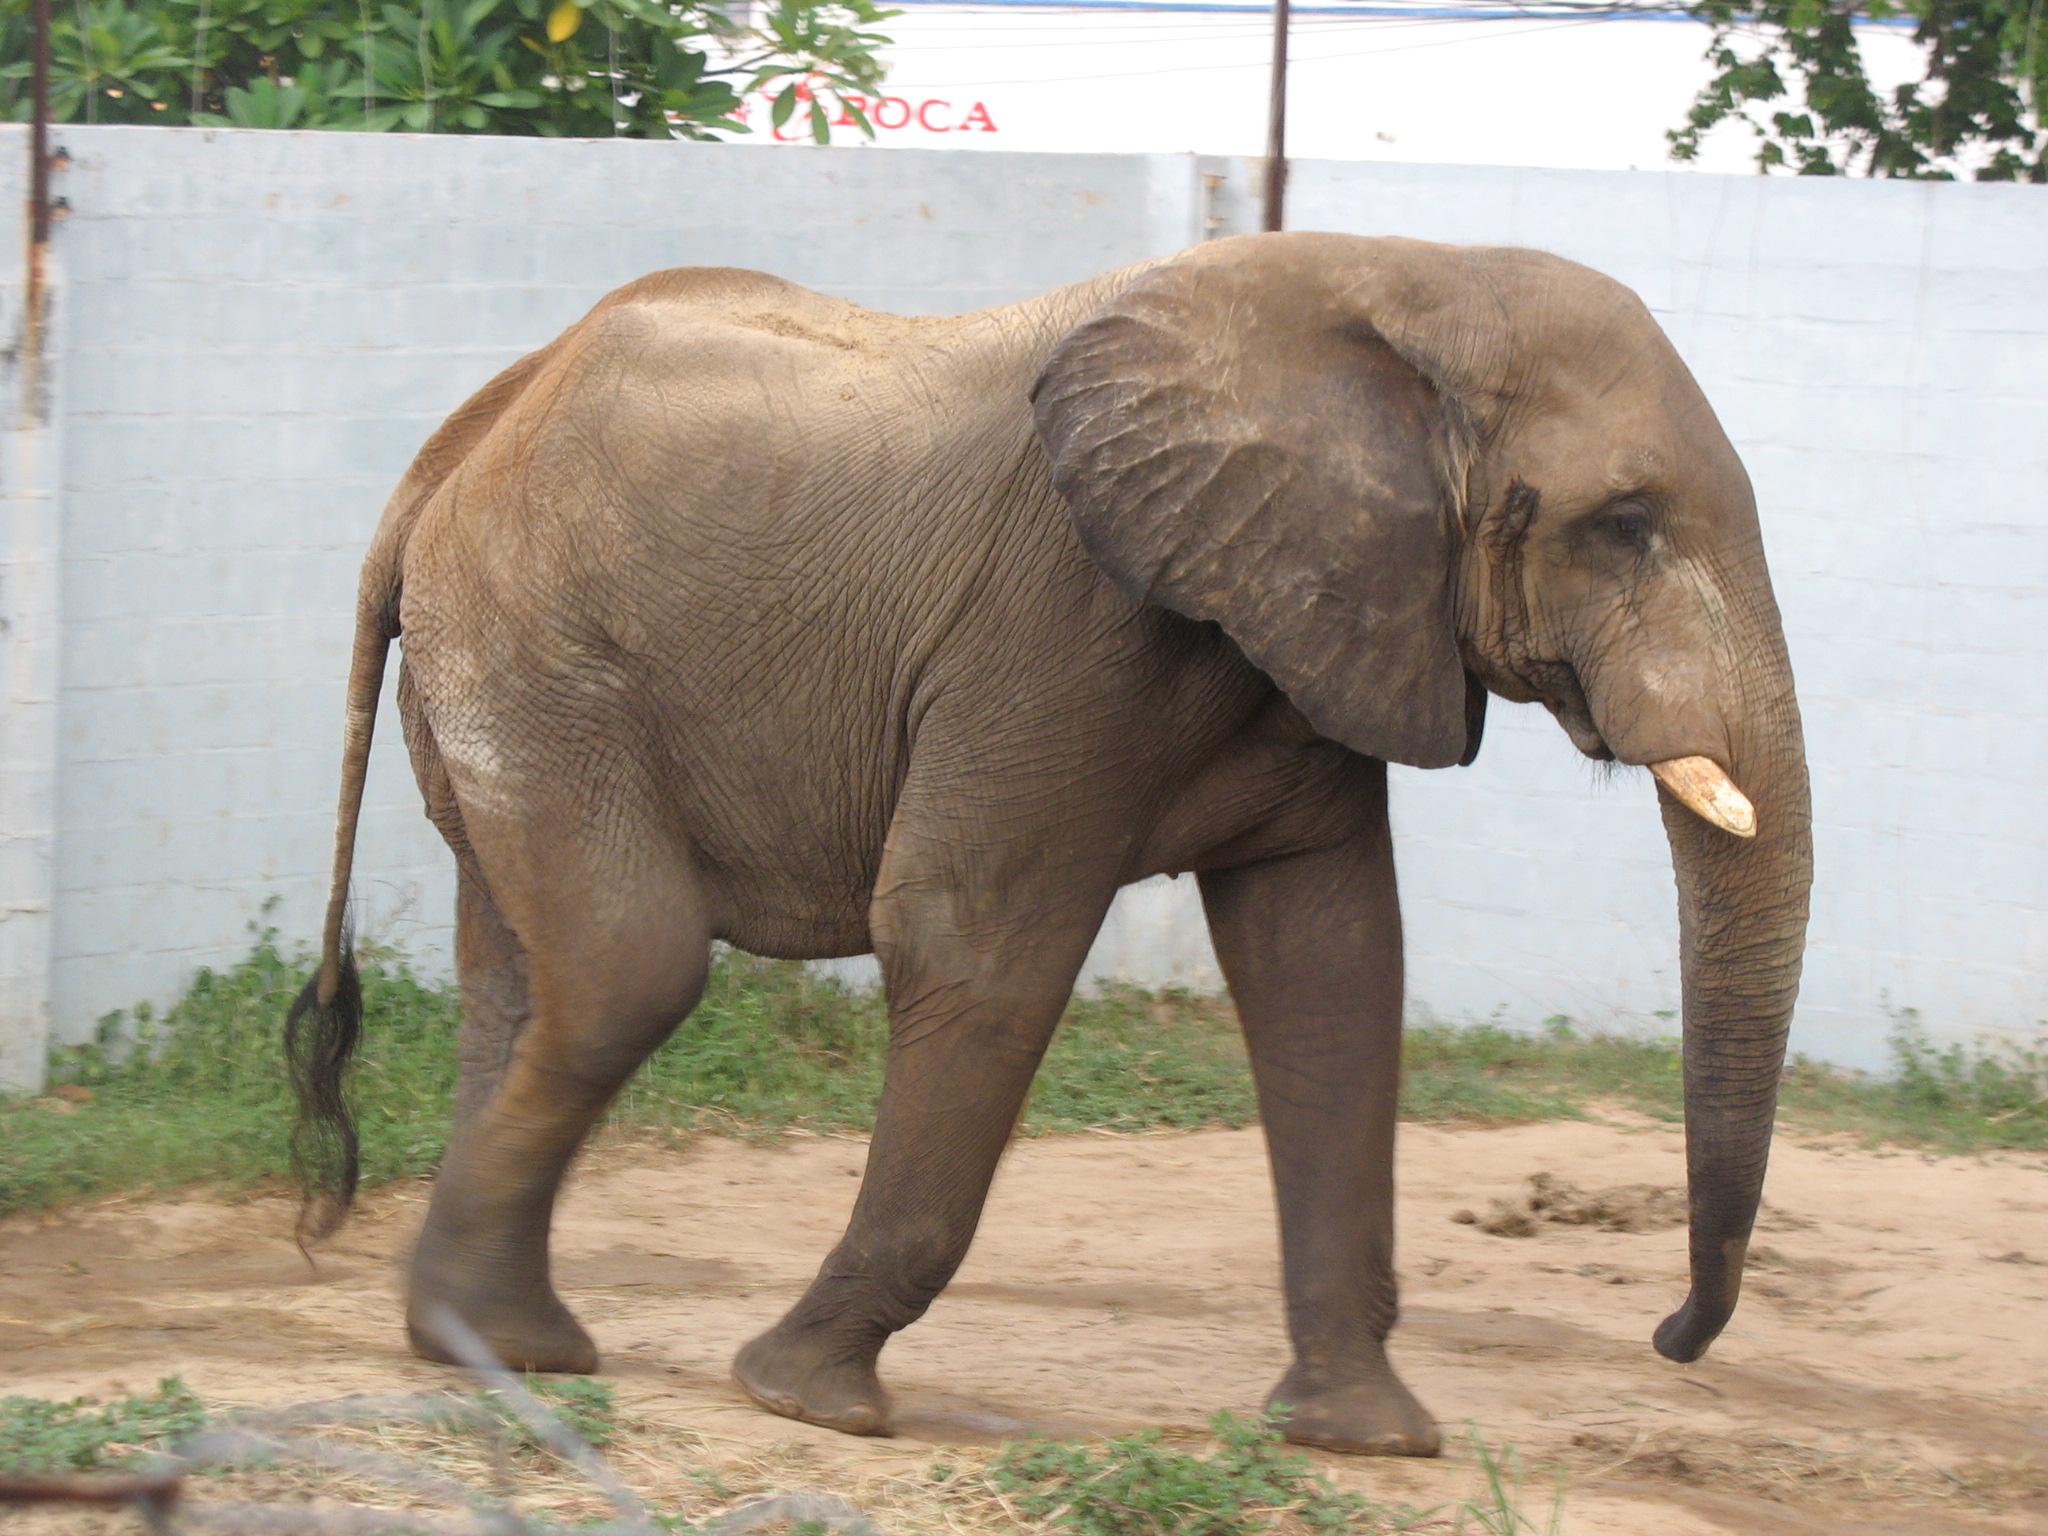 File:Barranquila Zoológico Elefante.jpg - Wikimedia Commons